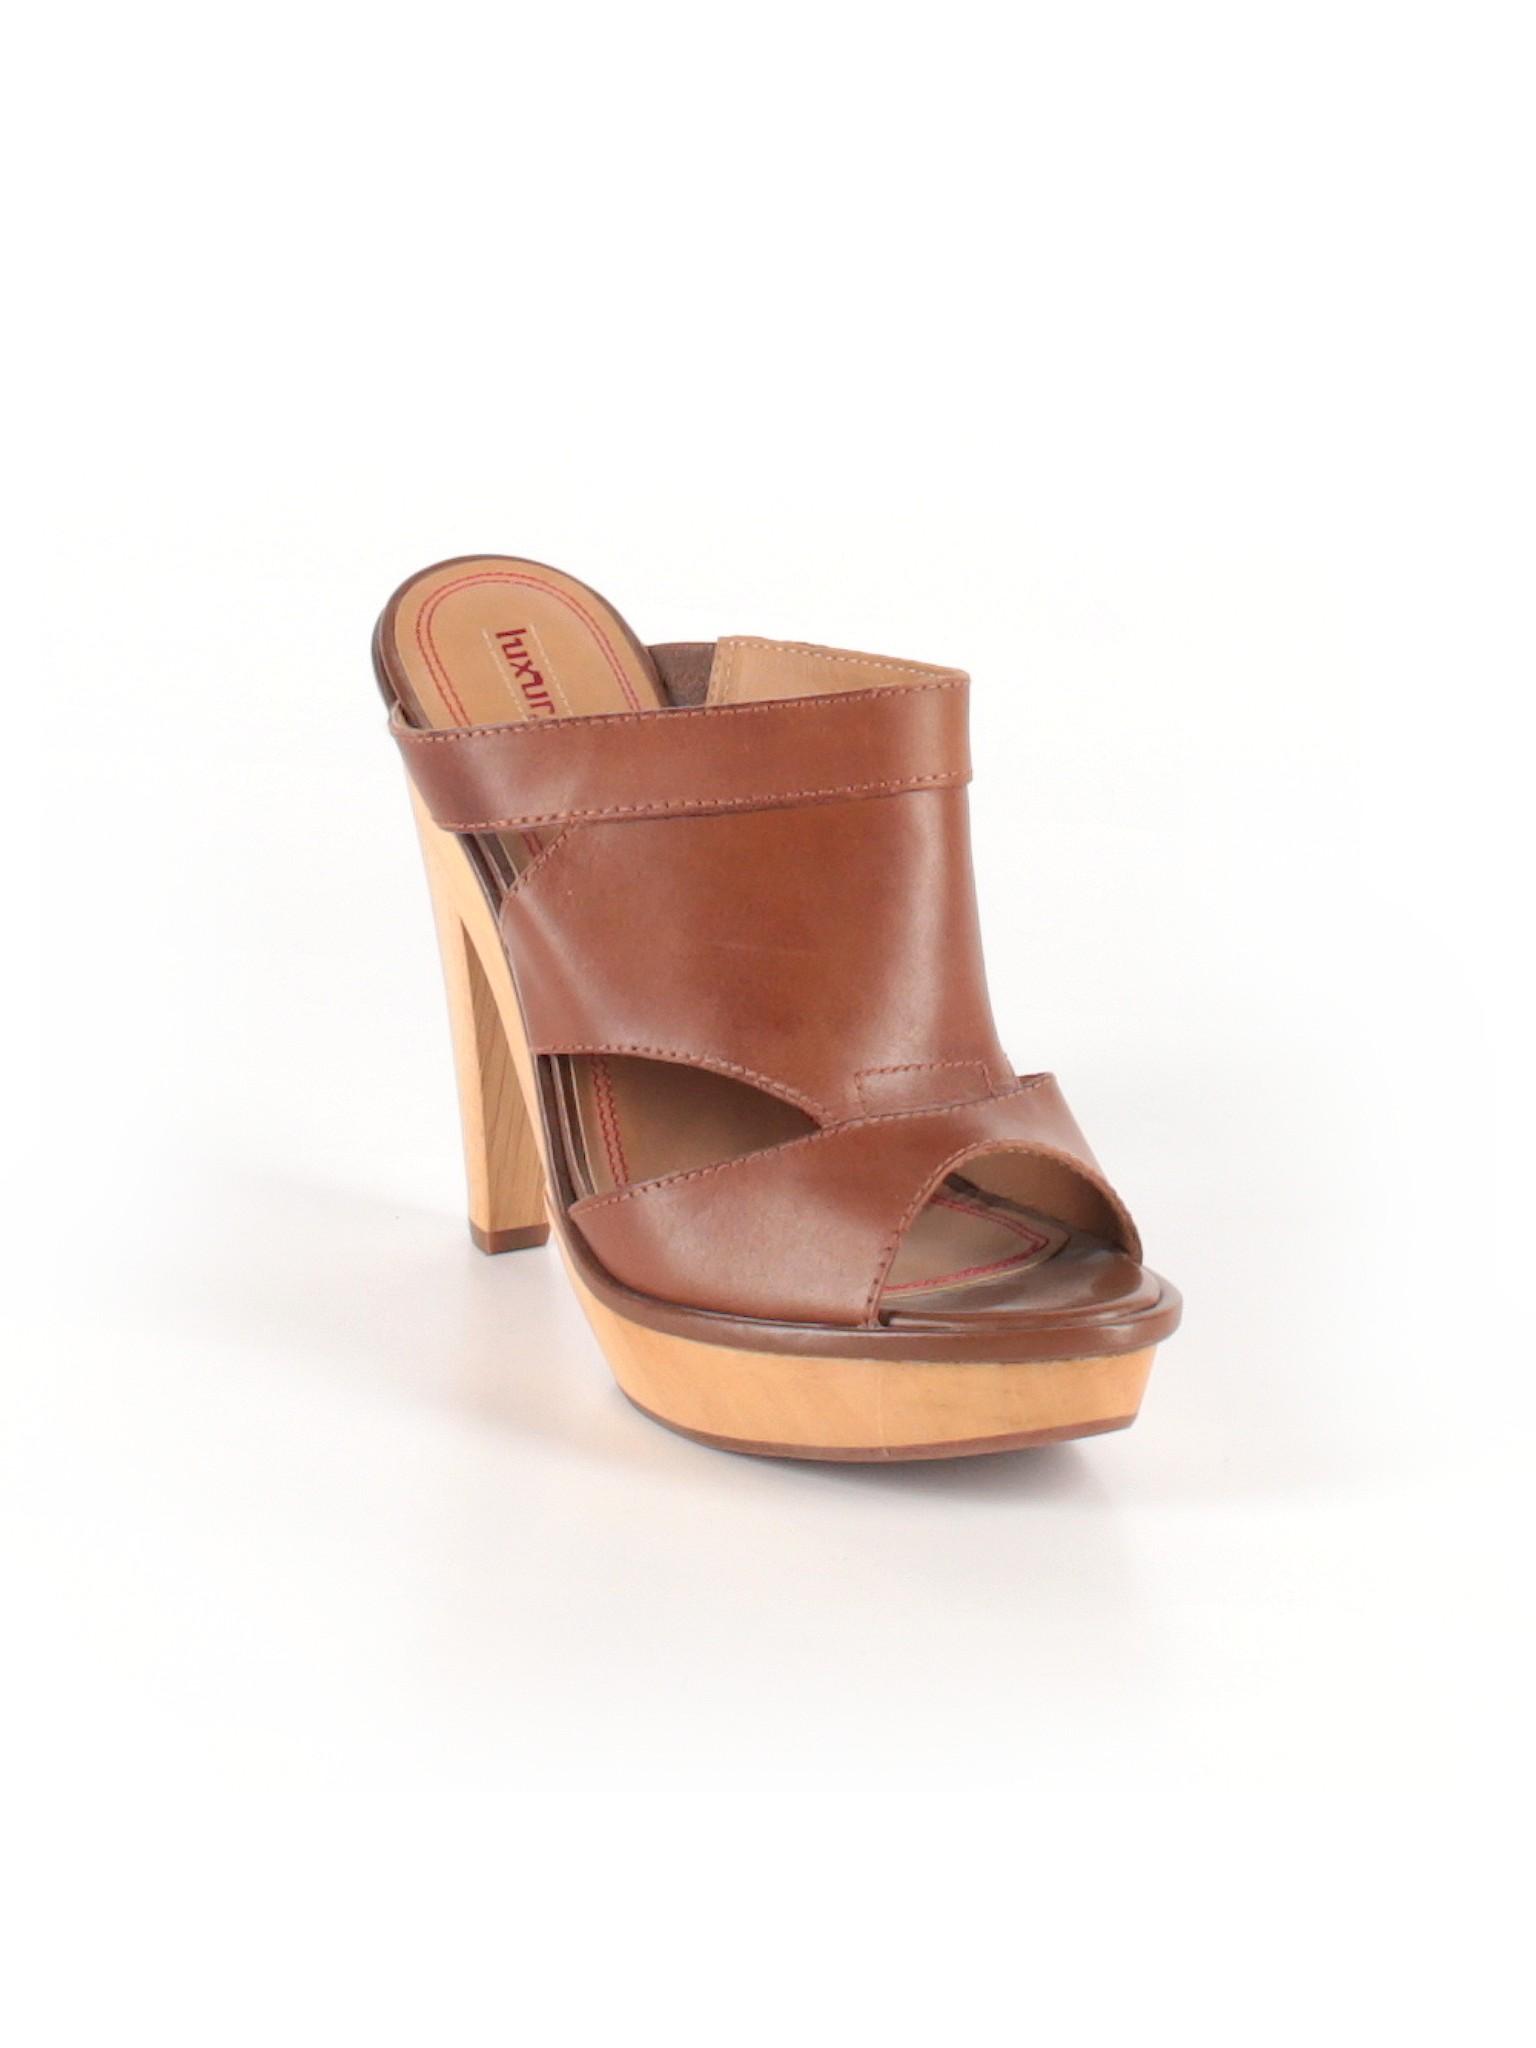 Mule promotion Rebel Luxury Boutique Clog Avq0FWS